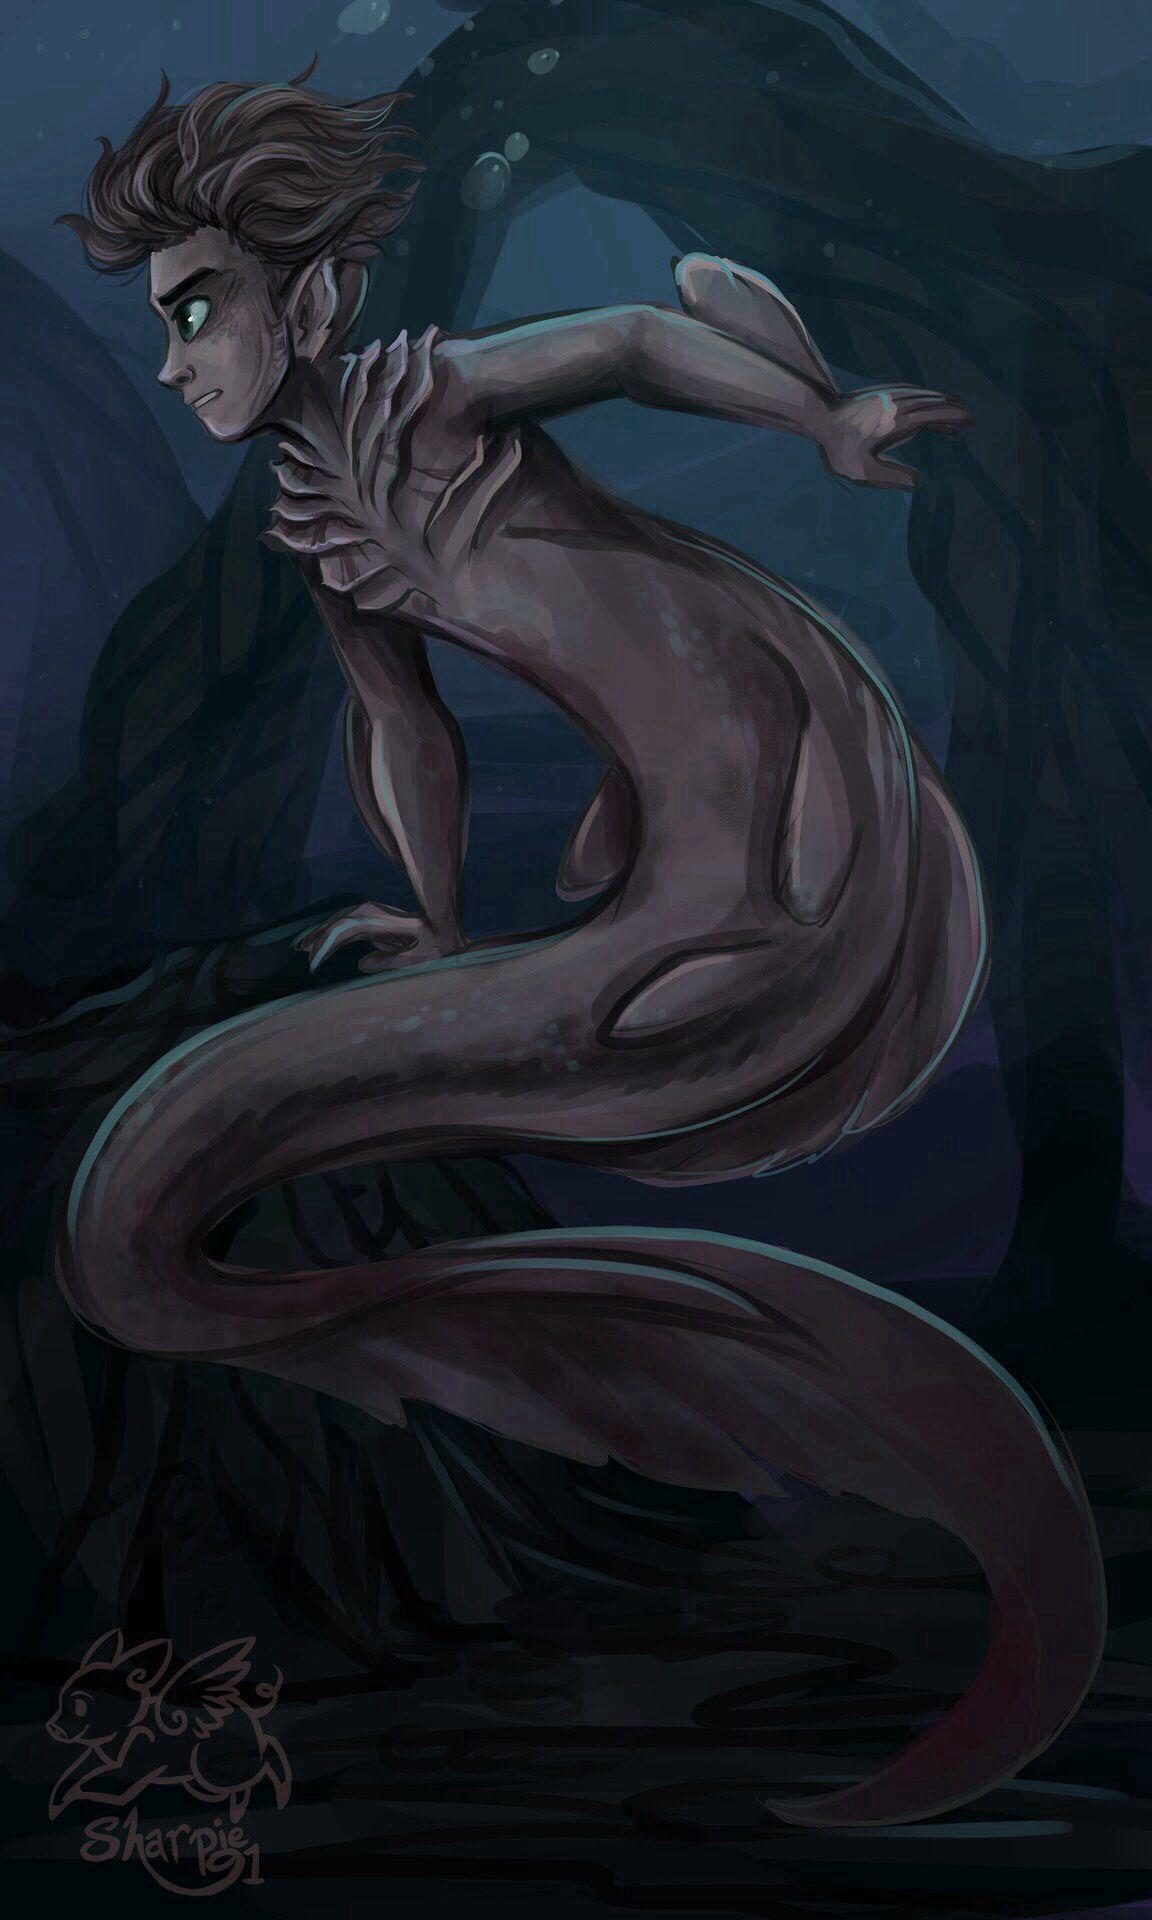 Sketch Please » Half Shark Alligator Half Man (Dr. Octagon) |Half Human Half Shark